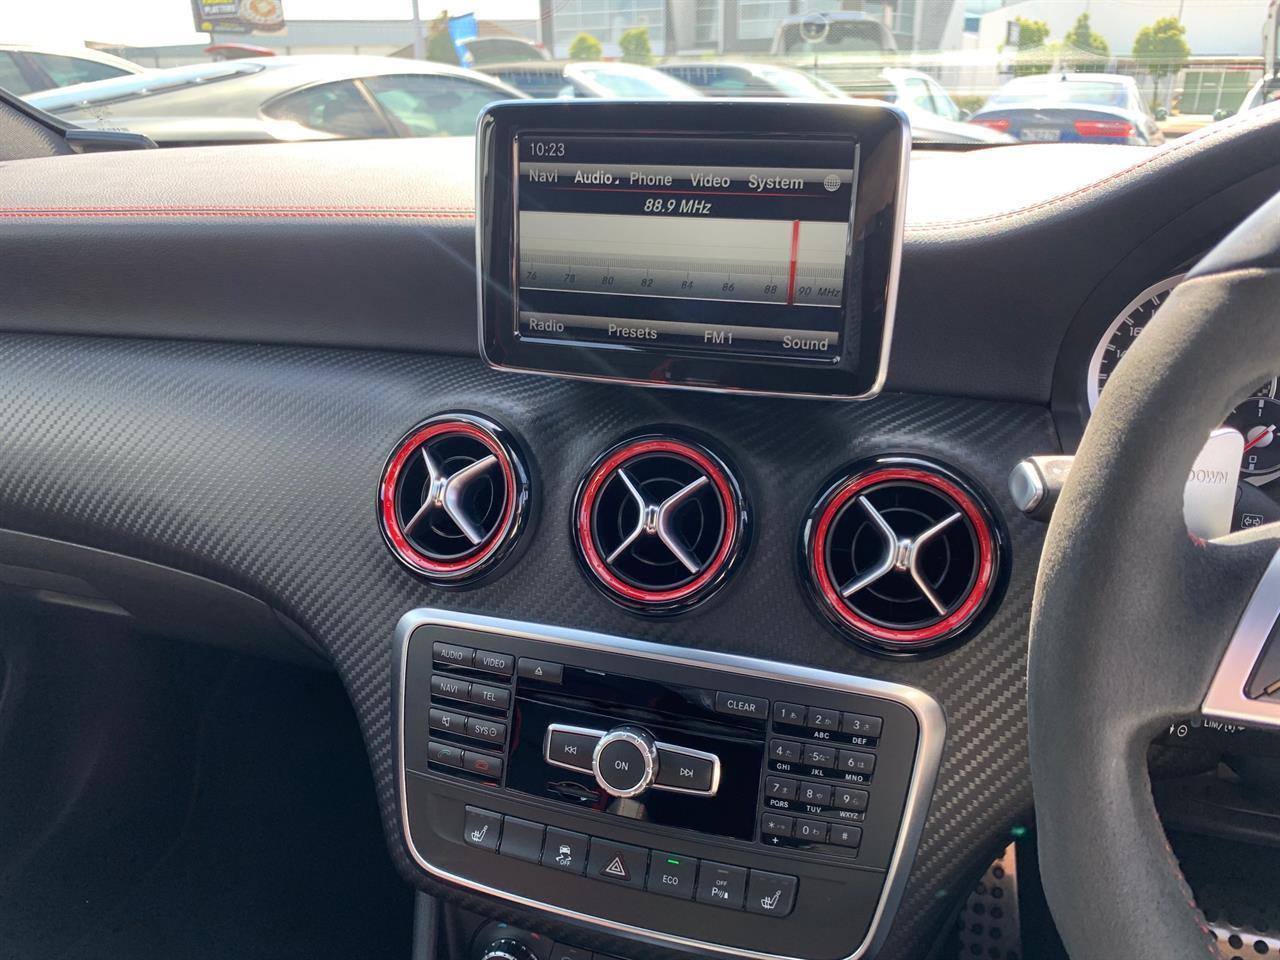 image-10, 2013 MercedesBenz A45 AMG 4Matic 4WD at Christchurch